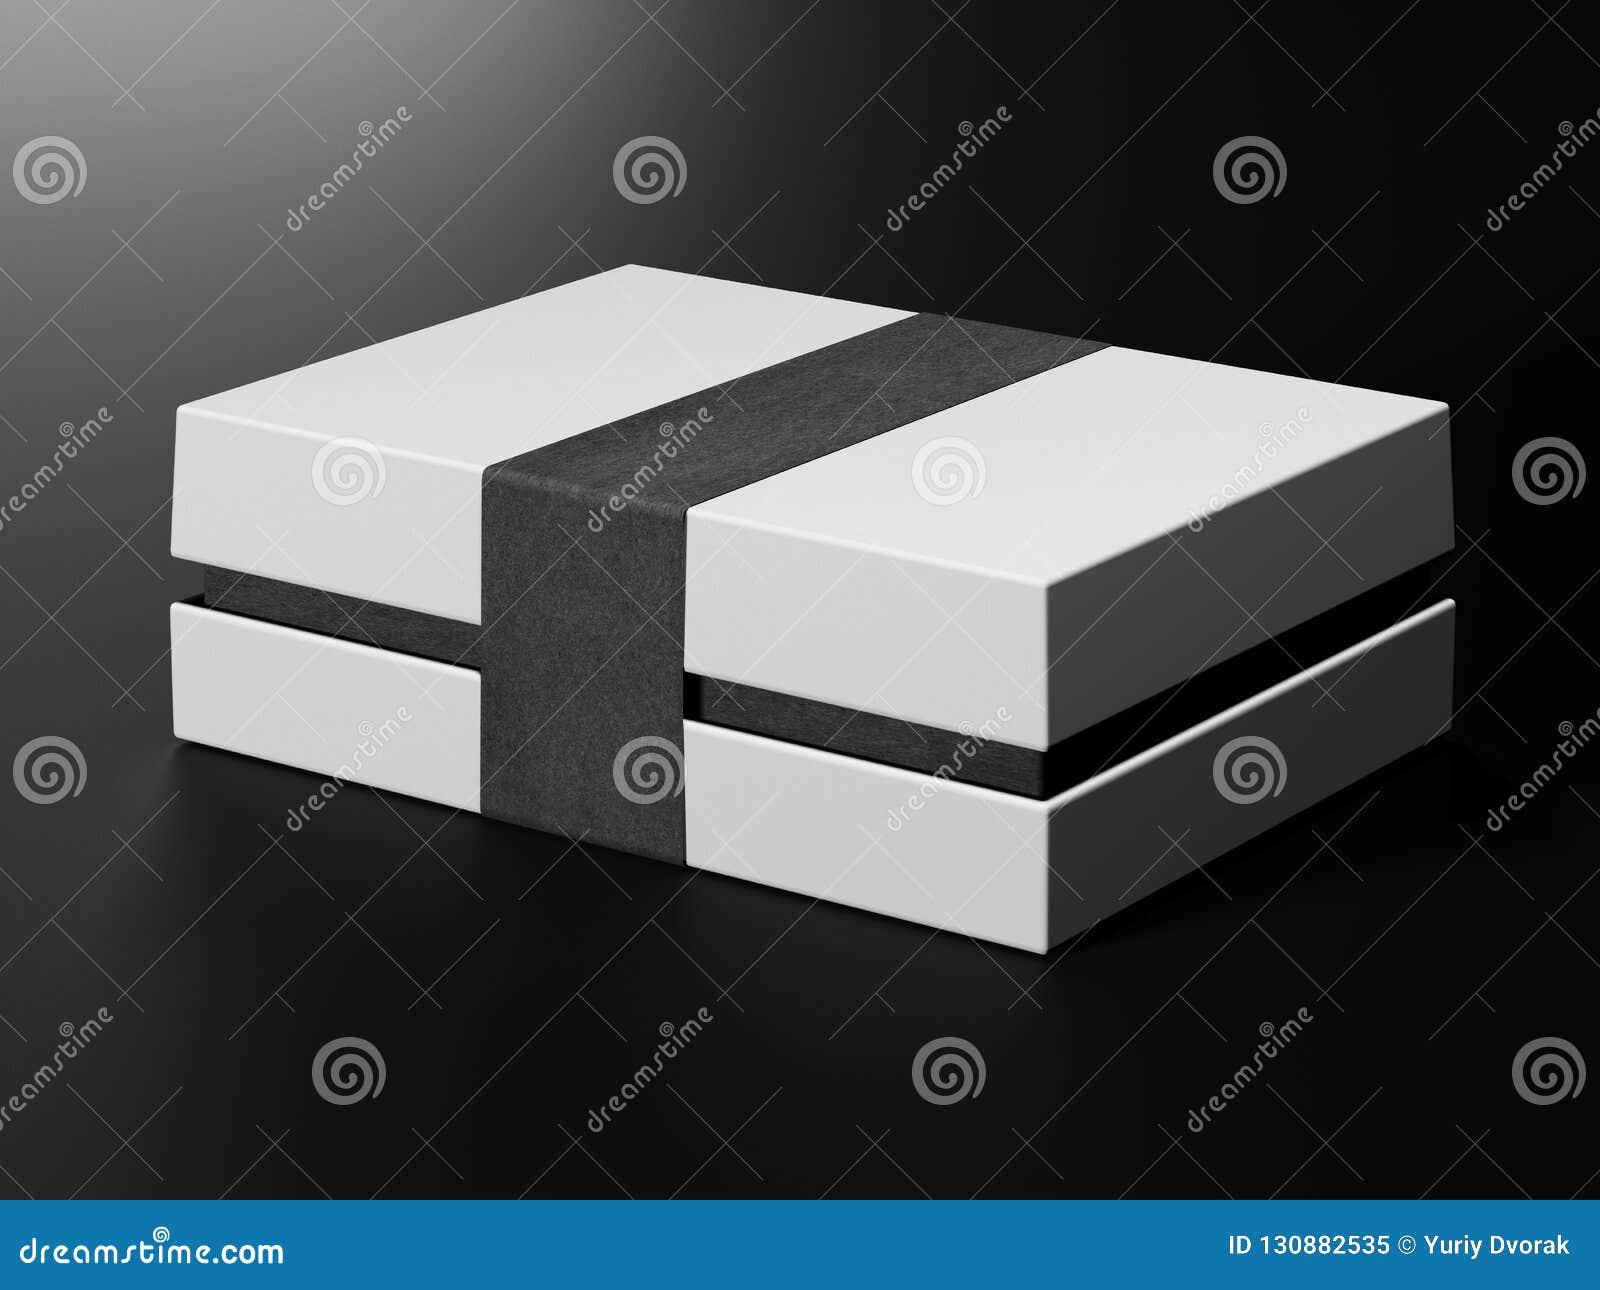 white box mock up blank flat white paper cardboard box template